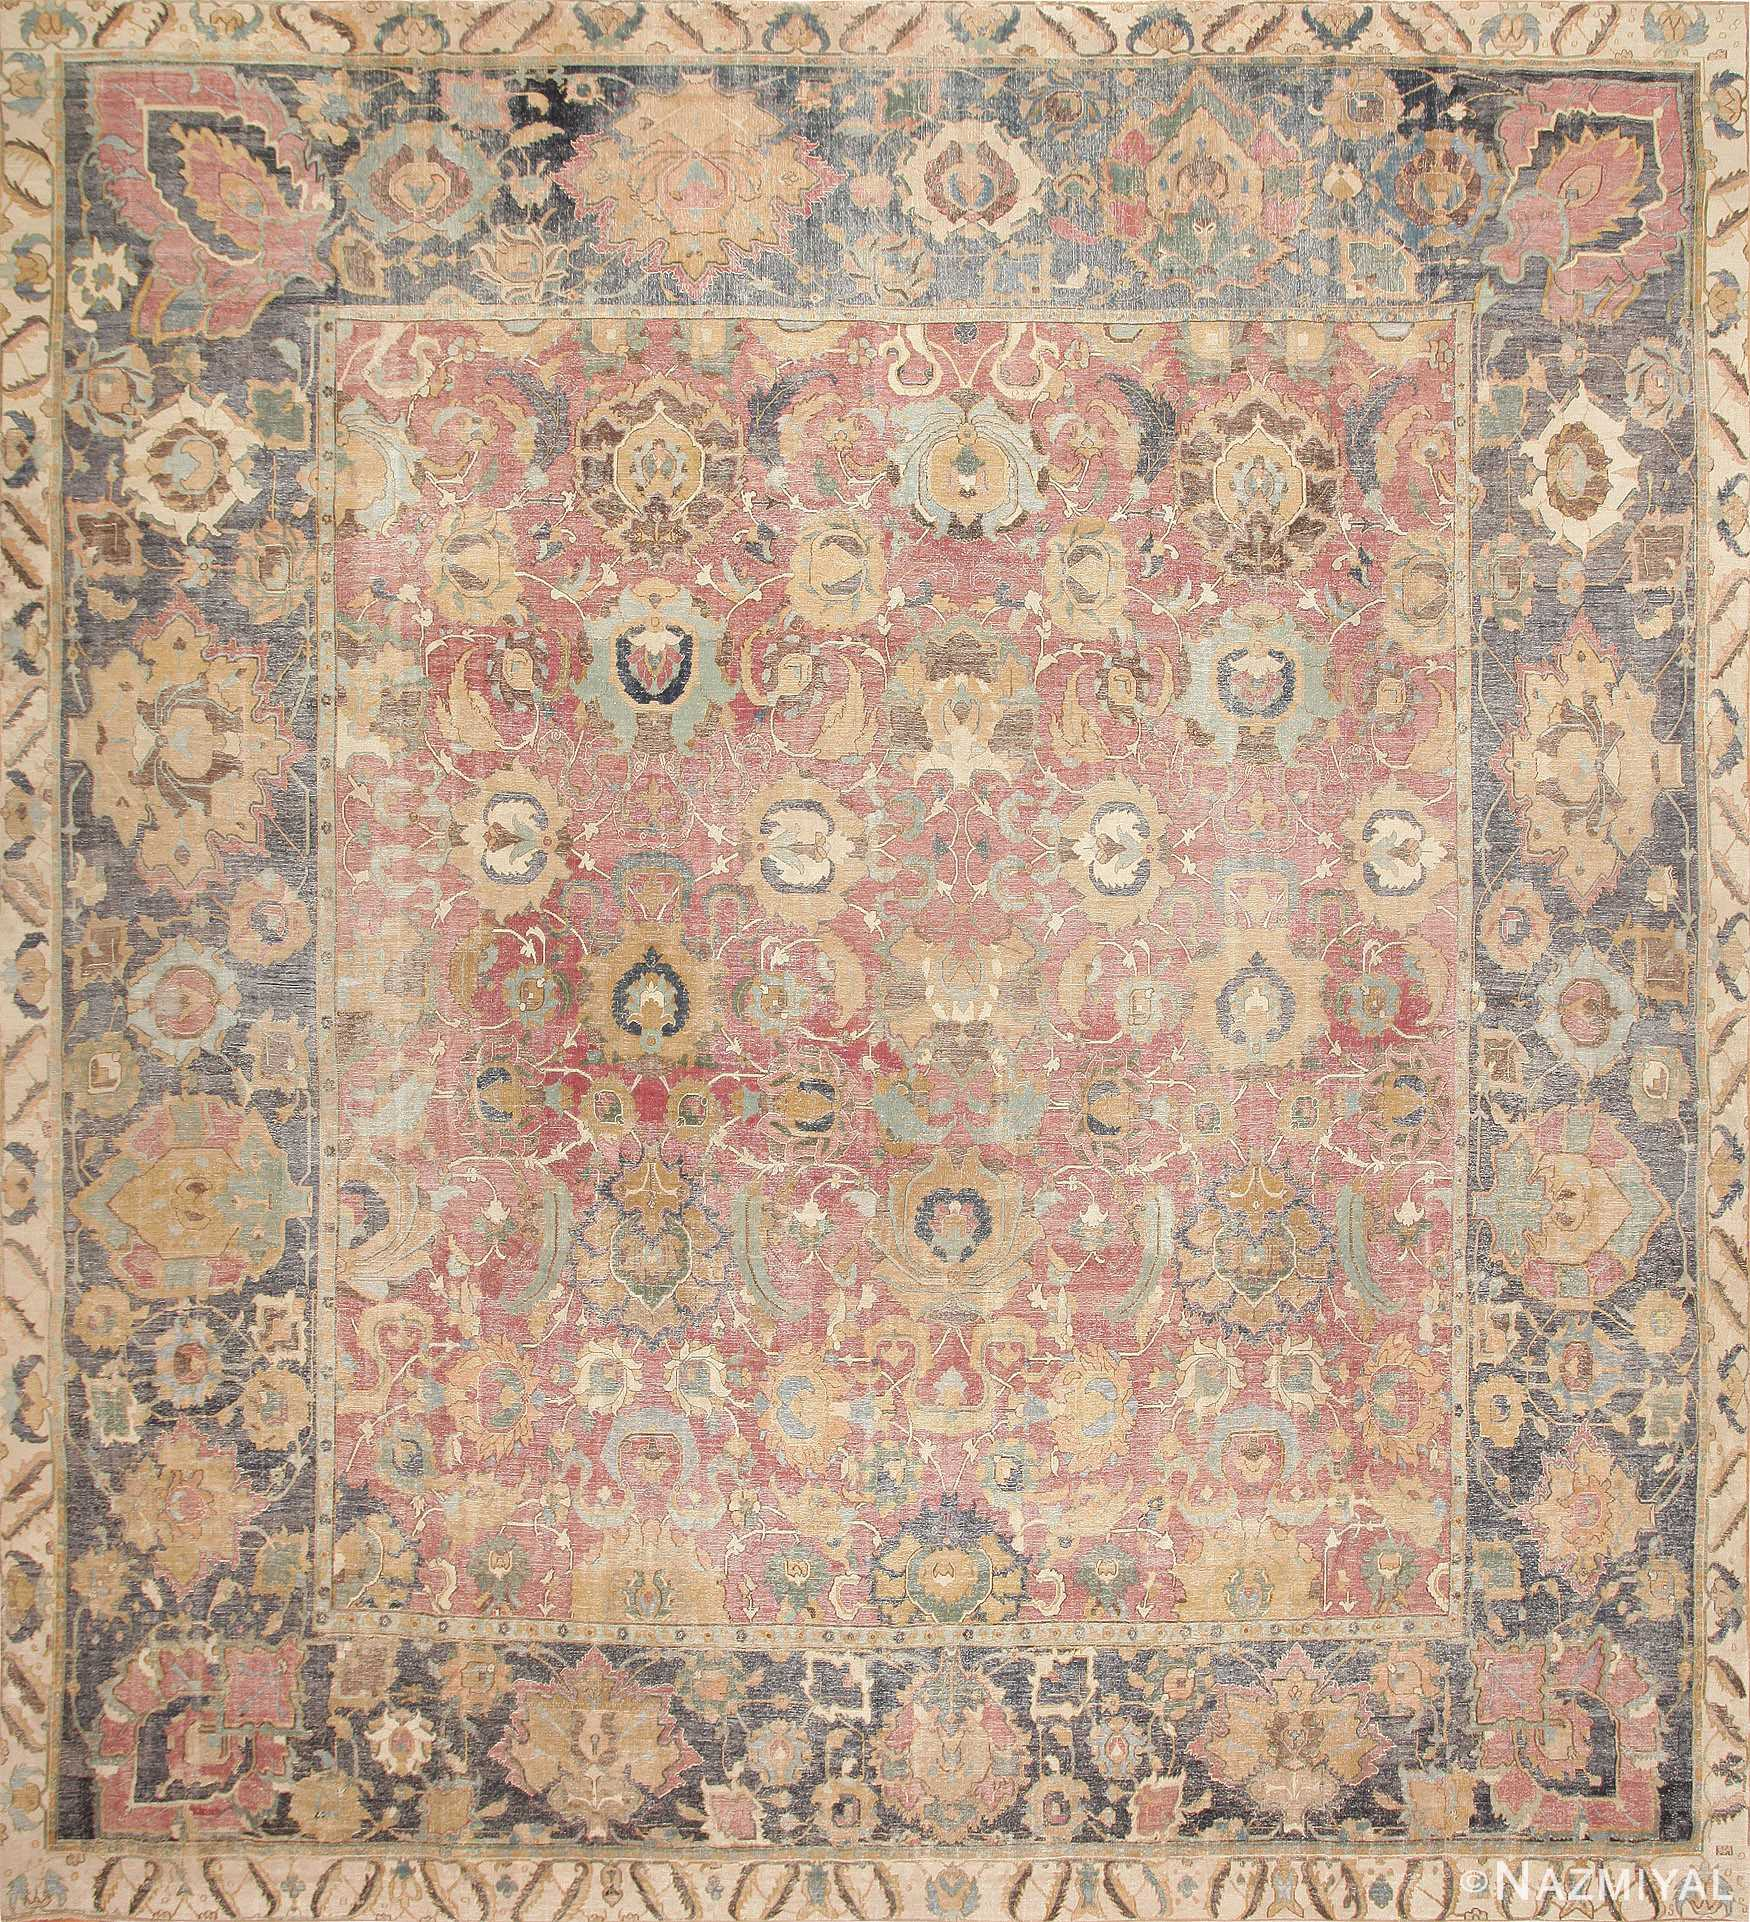 17th Century Persian Isfahan Carpet 44889 Detail/Large View